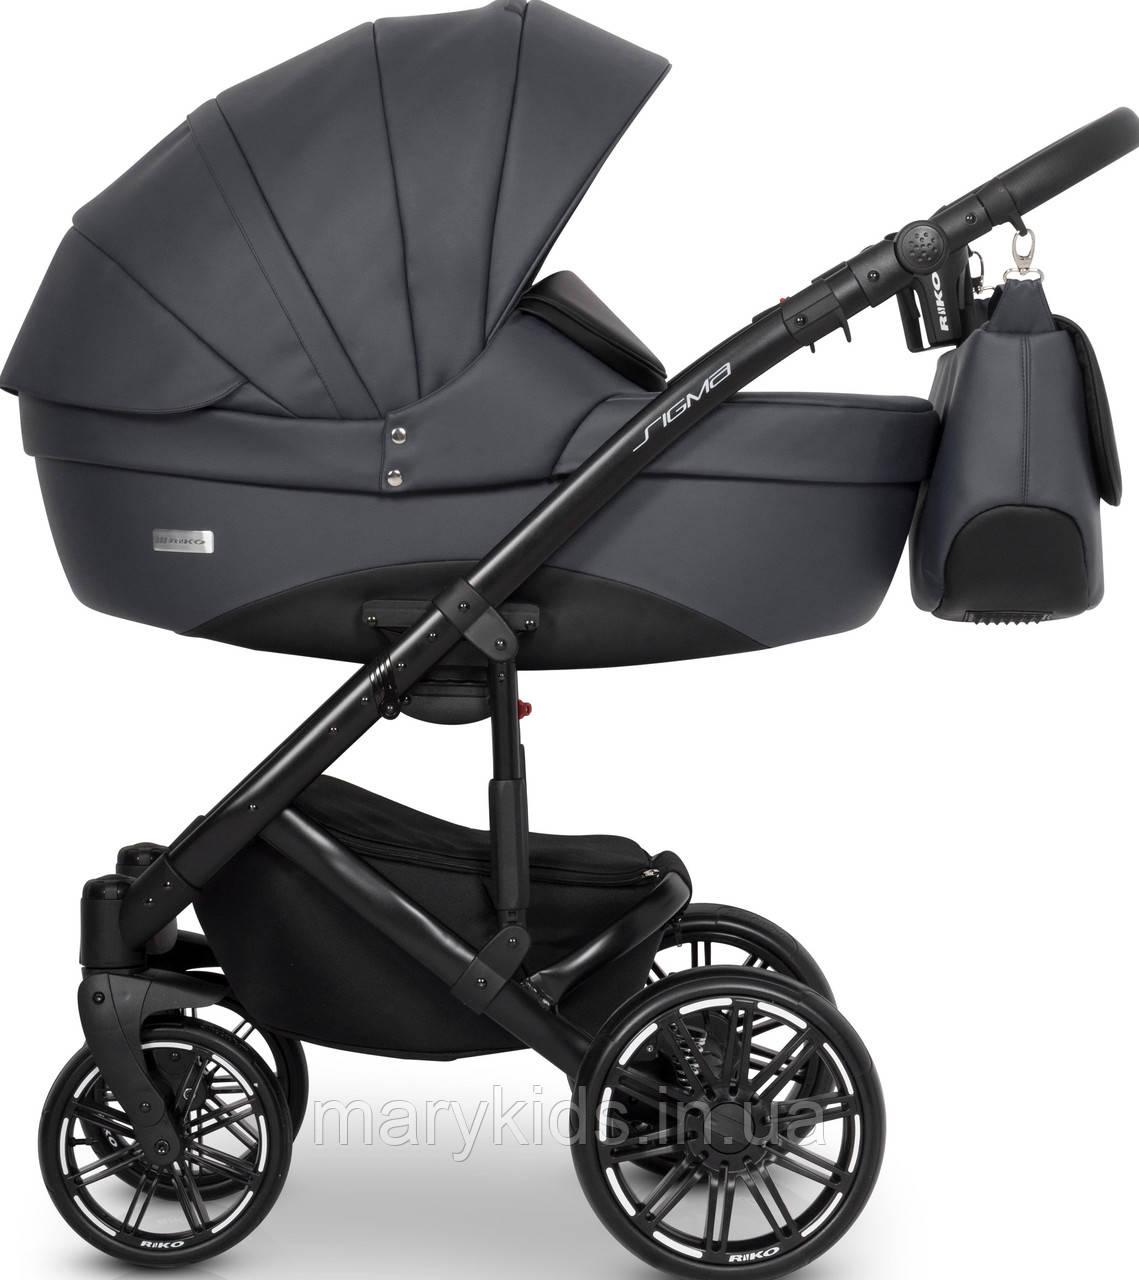 Дитяча універсальна коляска 3 в 1 Riko Sigma 01 Antracite